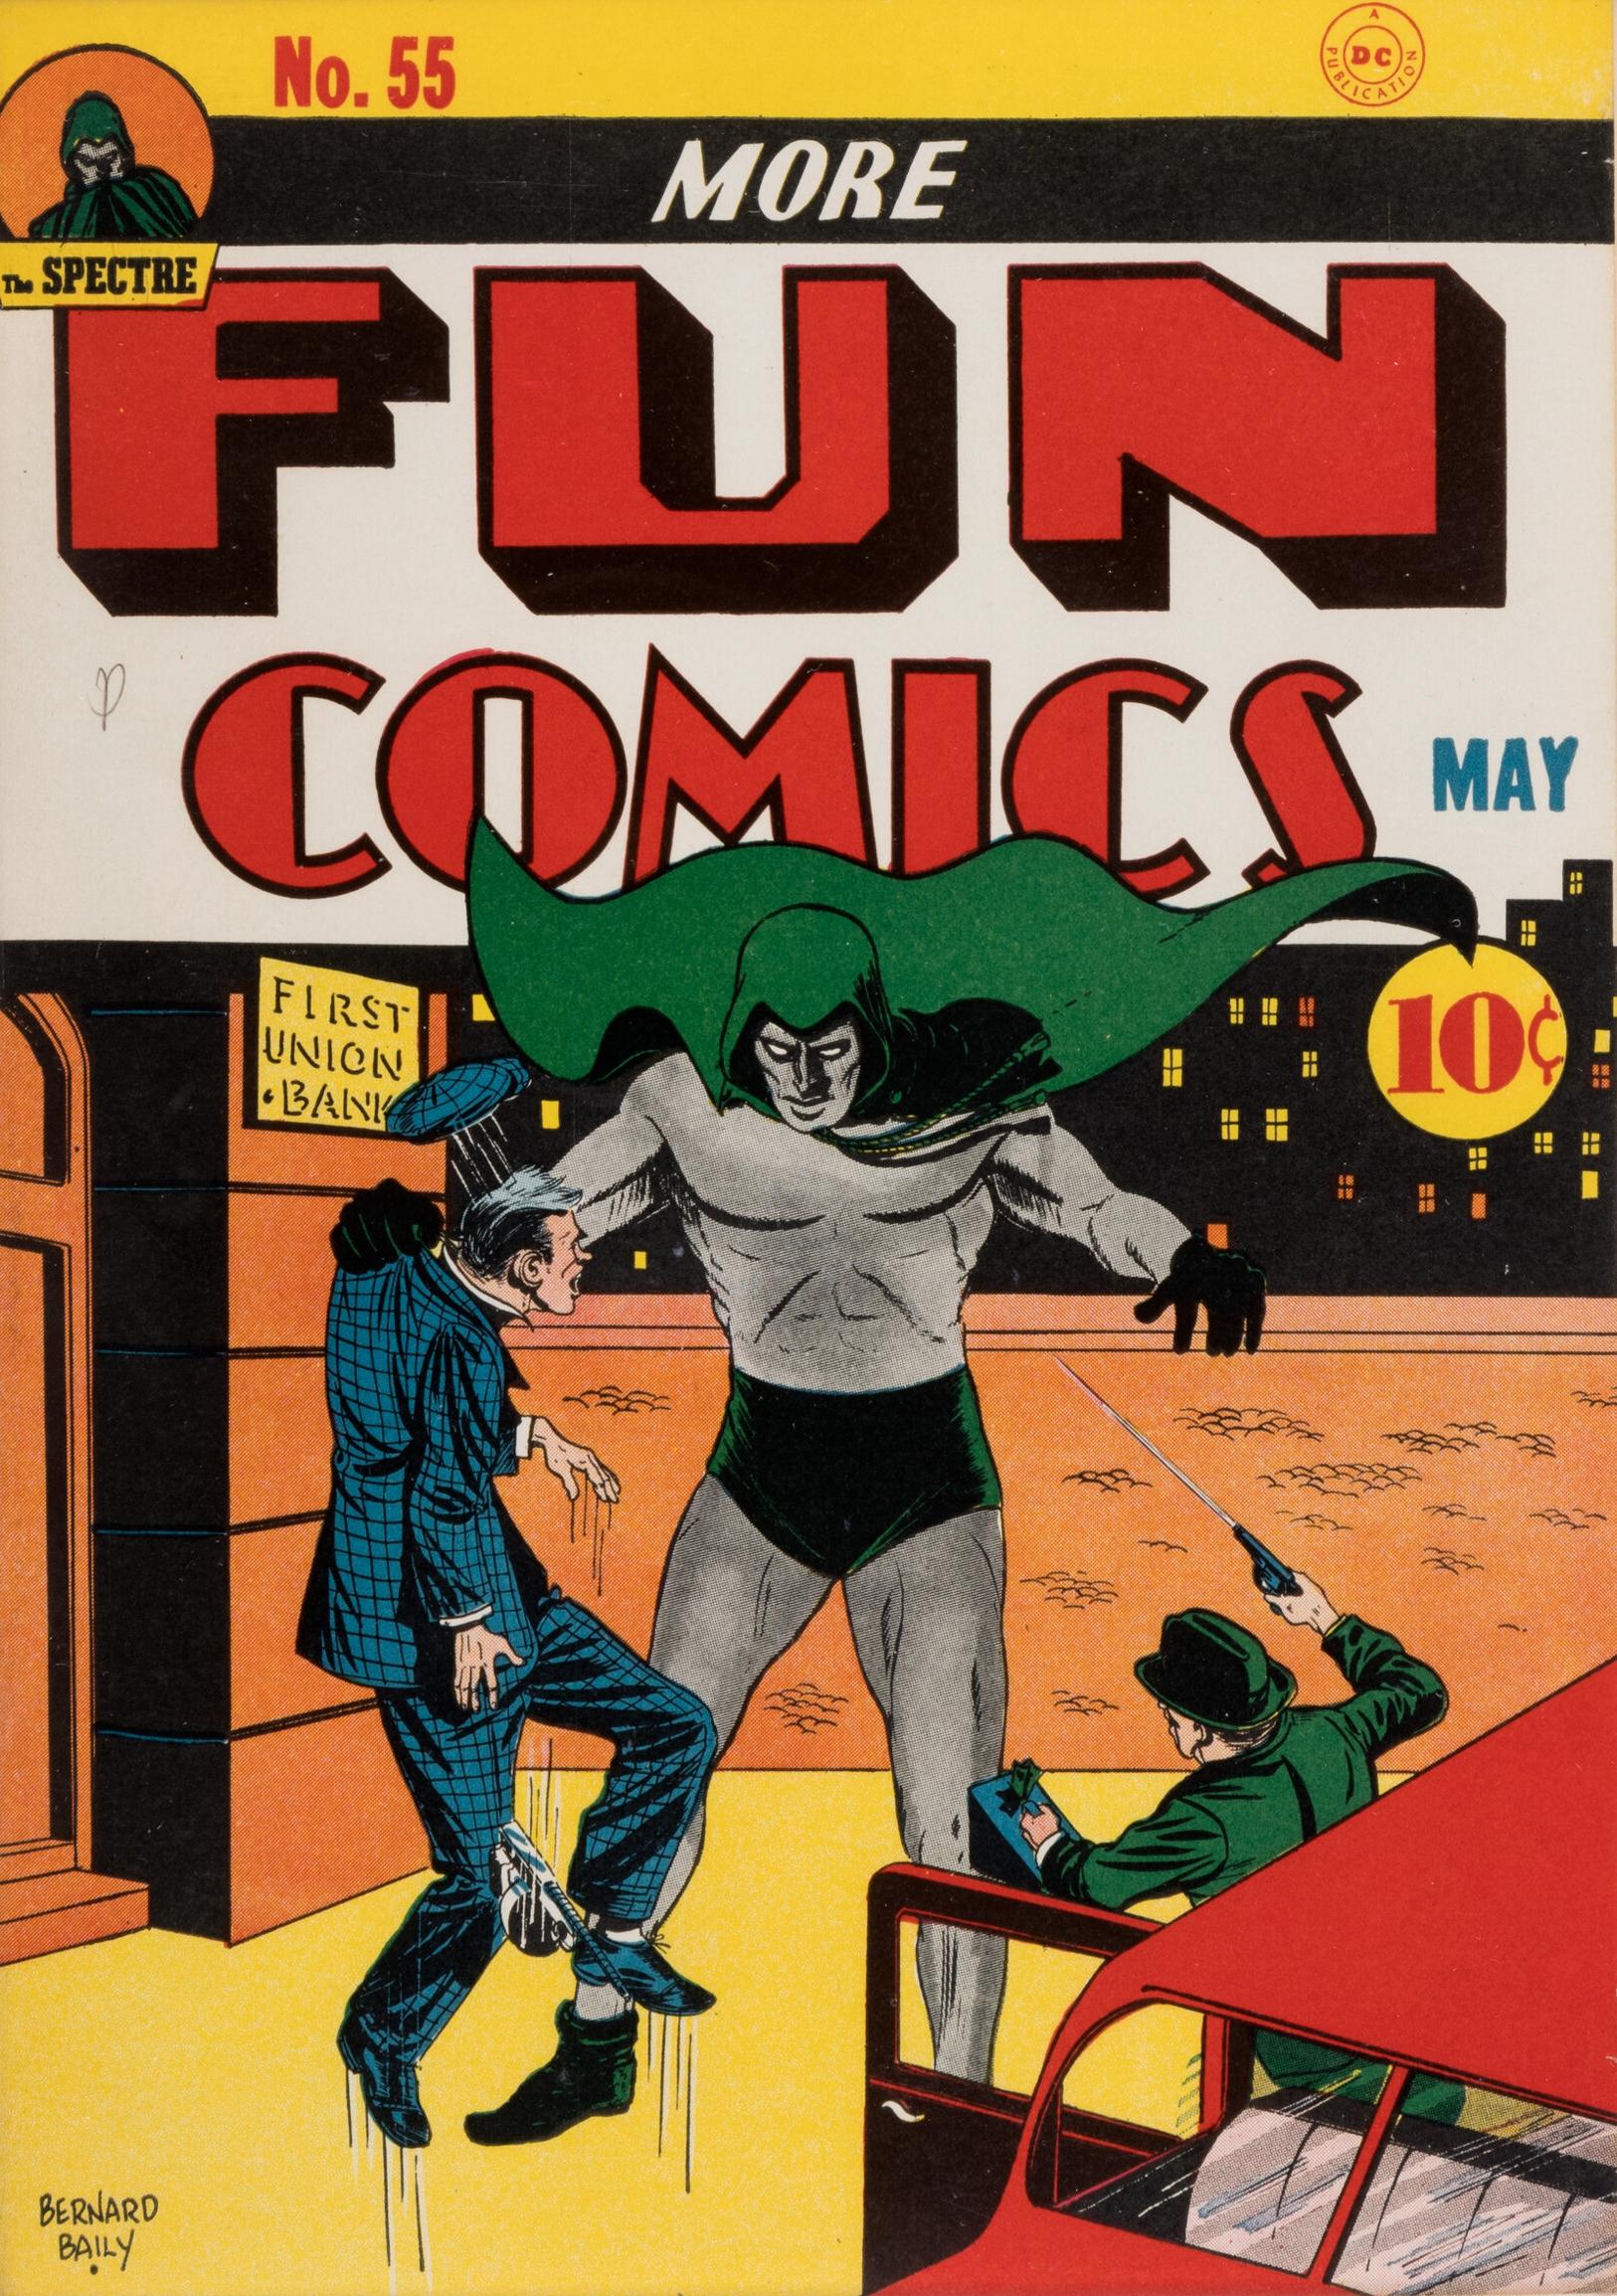 More Fun Comics Vol 1 55 - DC Comics Database